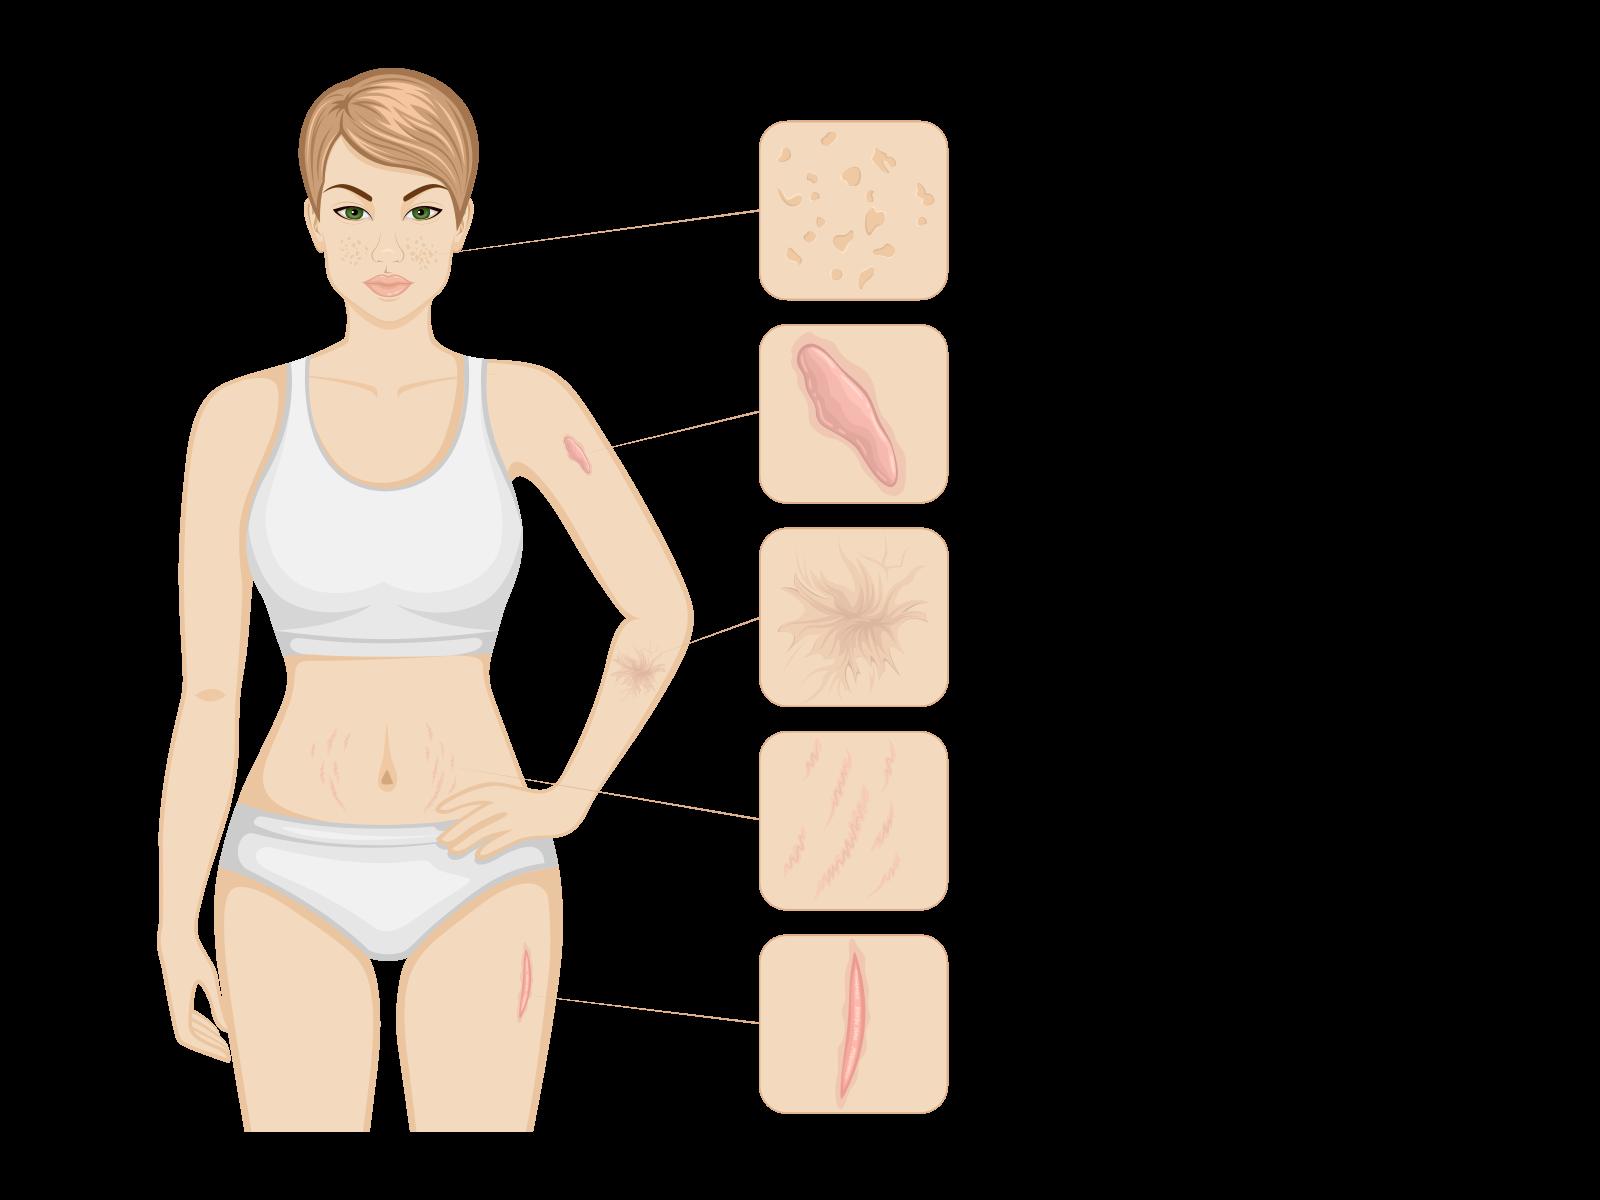 Illustration of different scar types